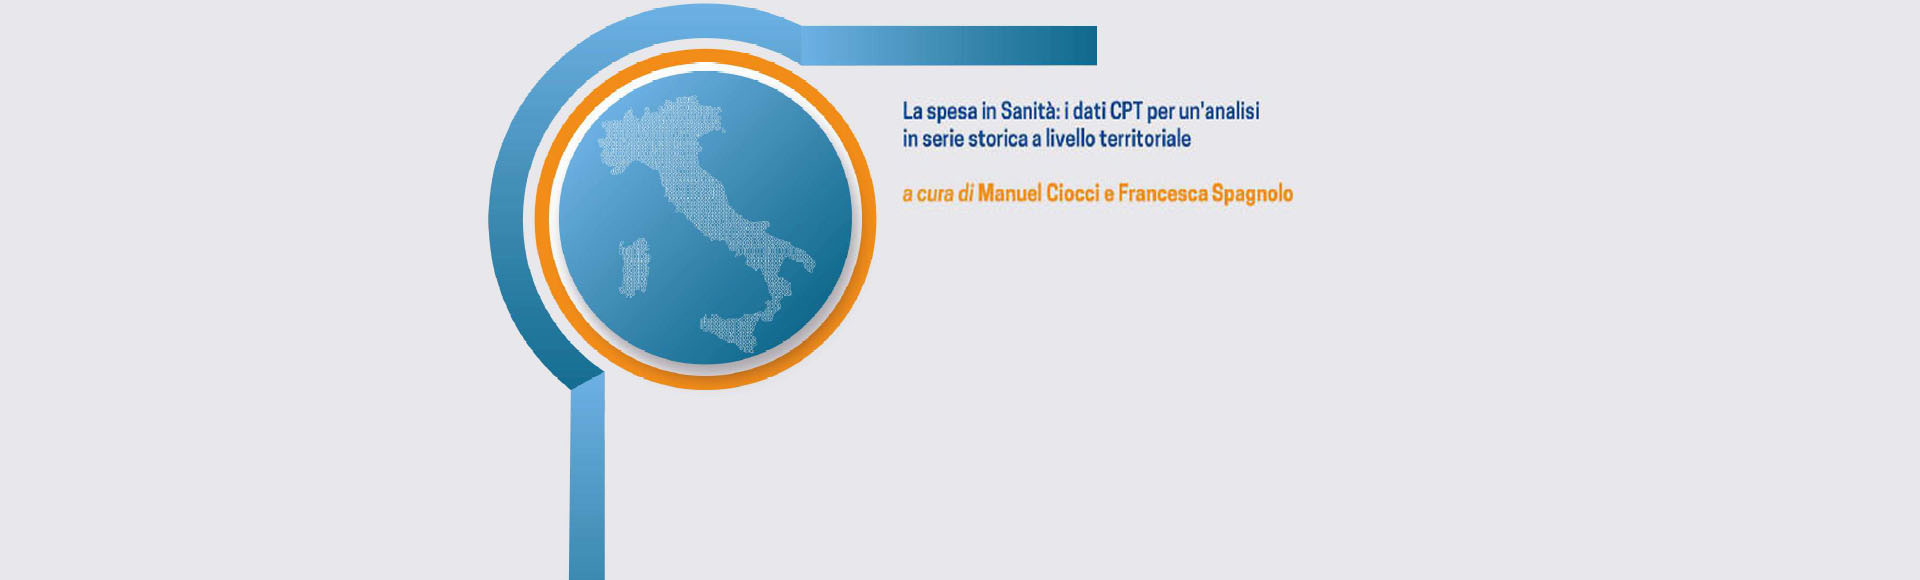 "CPT Informa n. 3/2020 ""La spesa in Sanità: i dati CPT per un'analisi in serie storica a livello territoriale"""